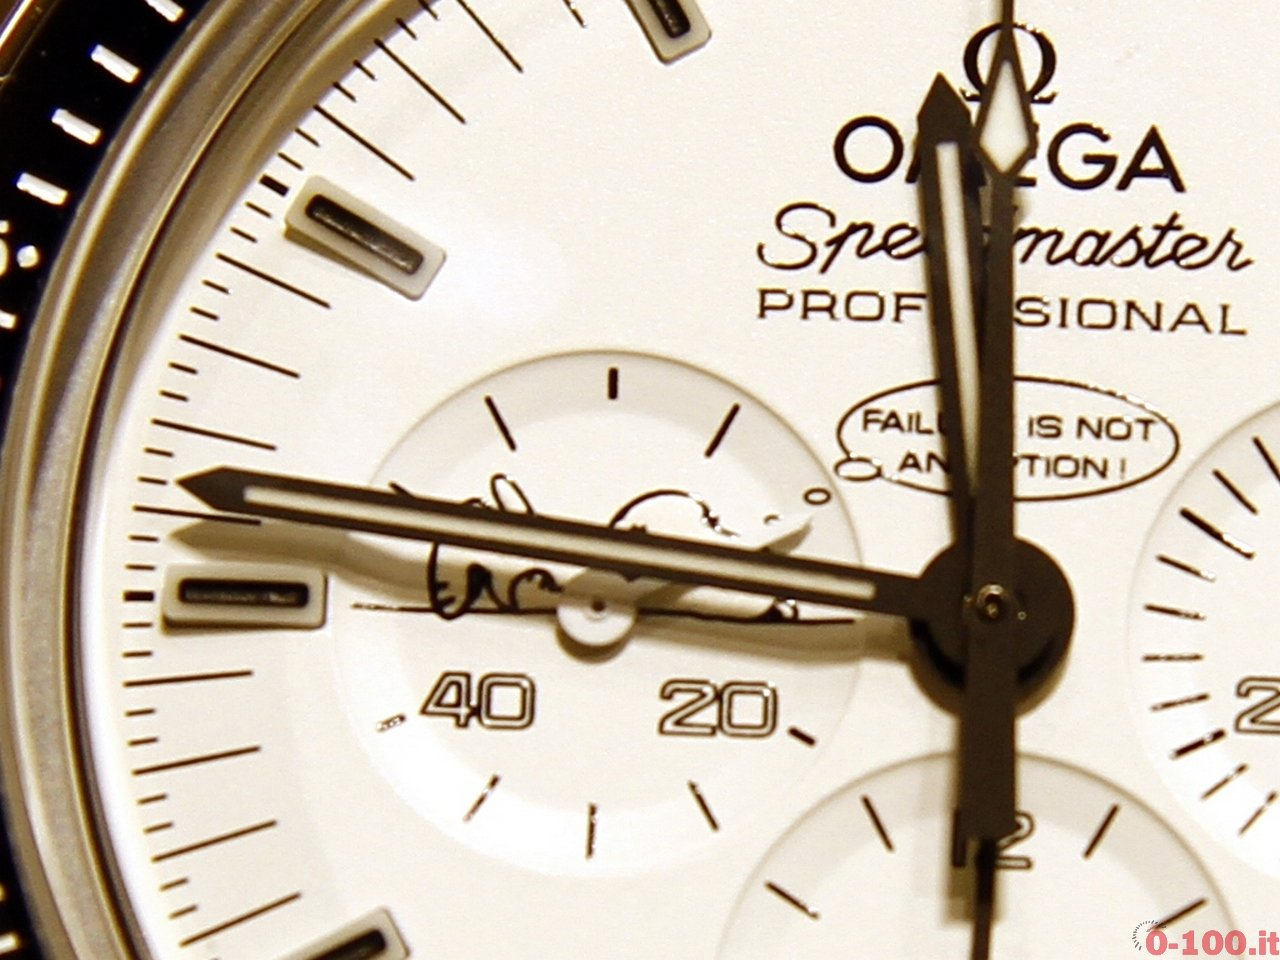 baselworld-2015-omega-speedmaster-moonwatch-apollo-14-snoopy-0-100_8